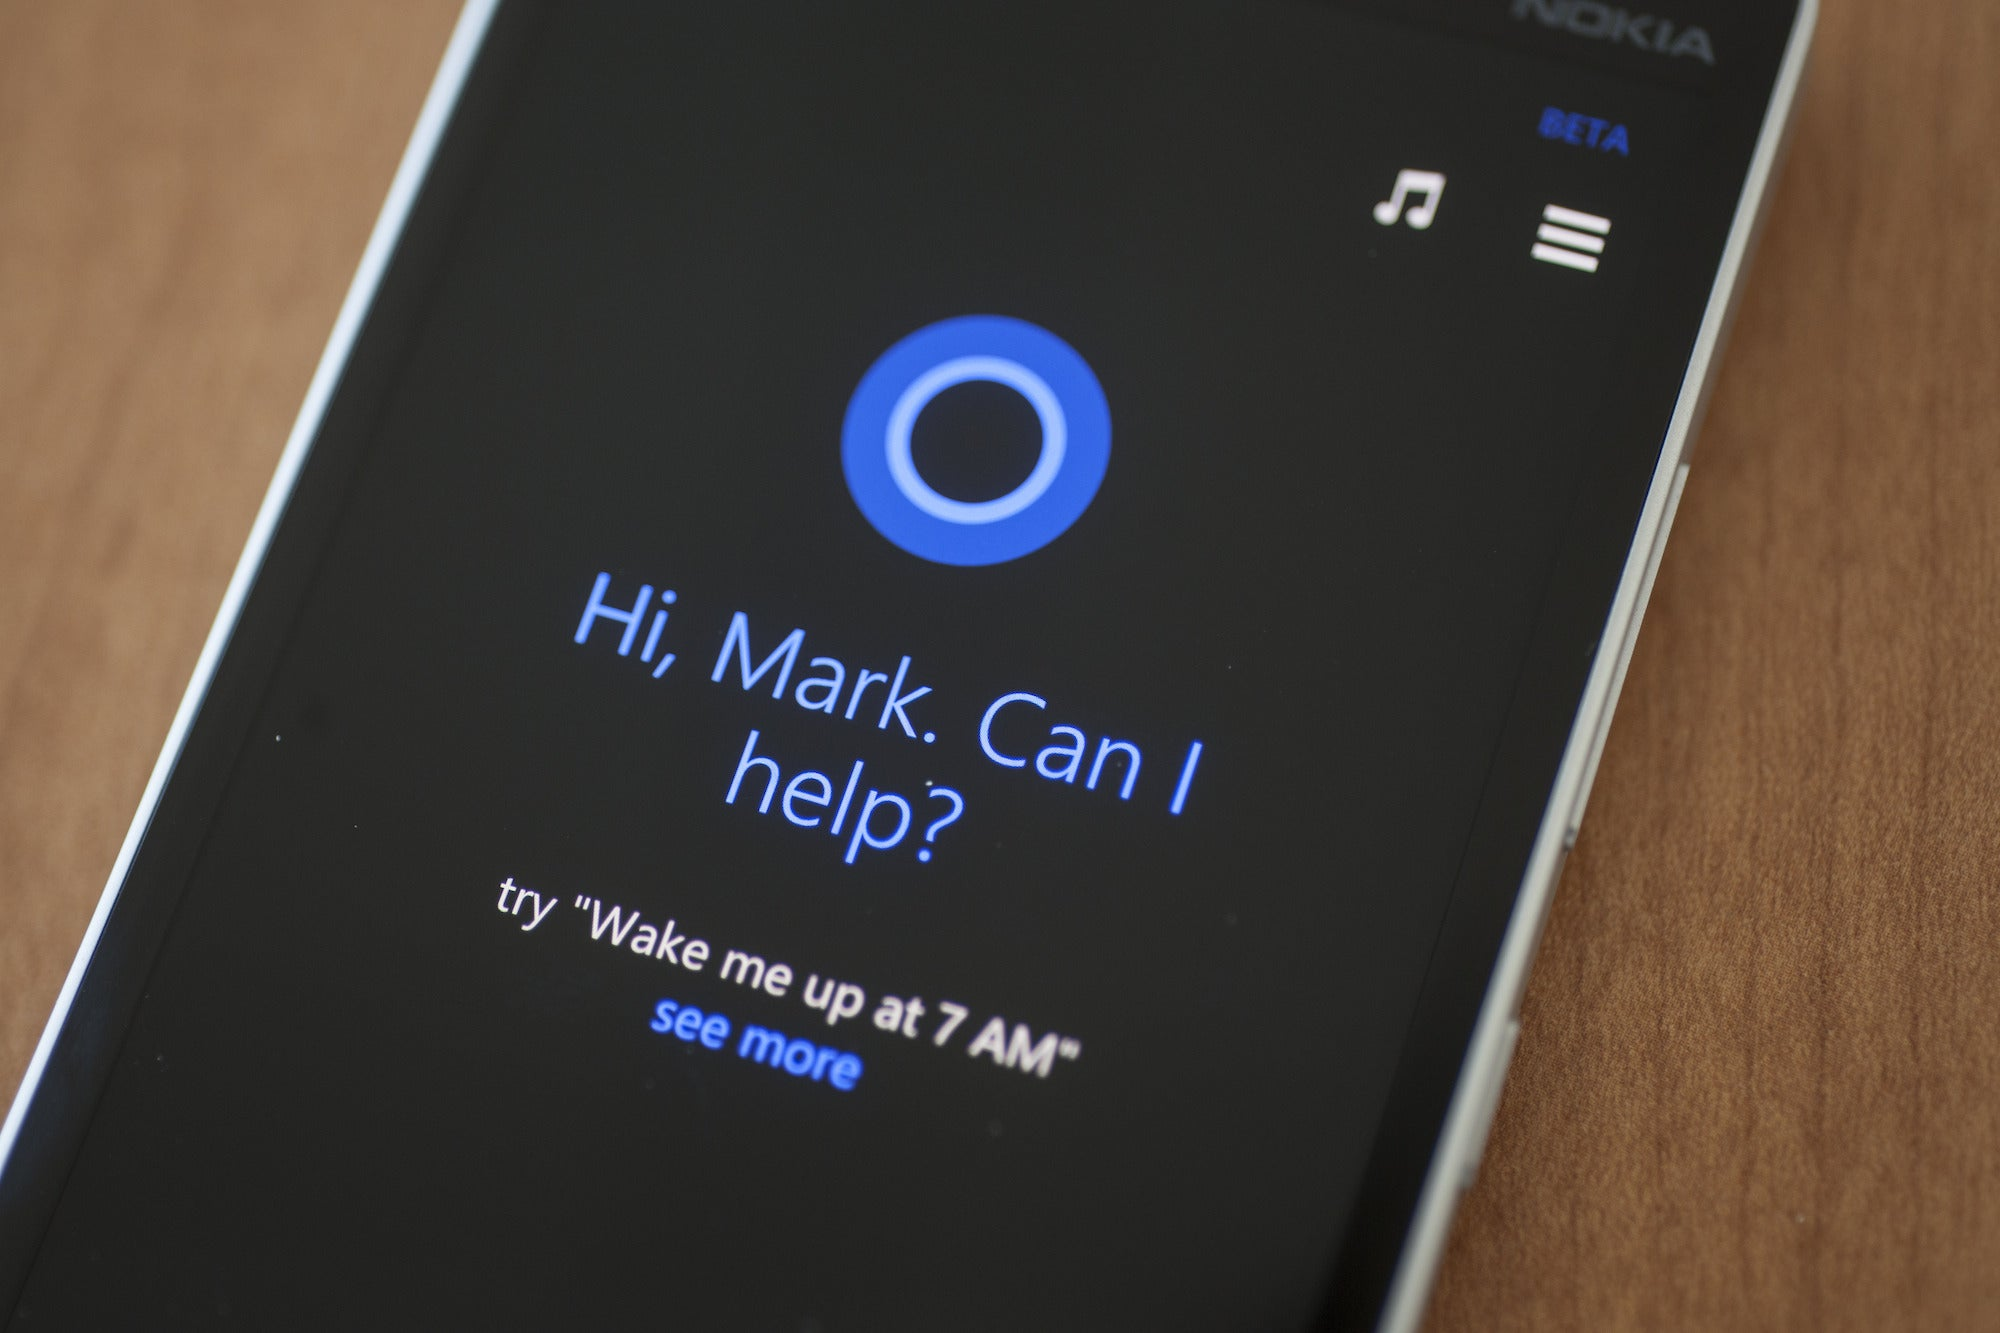 walmart app for windows phone